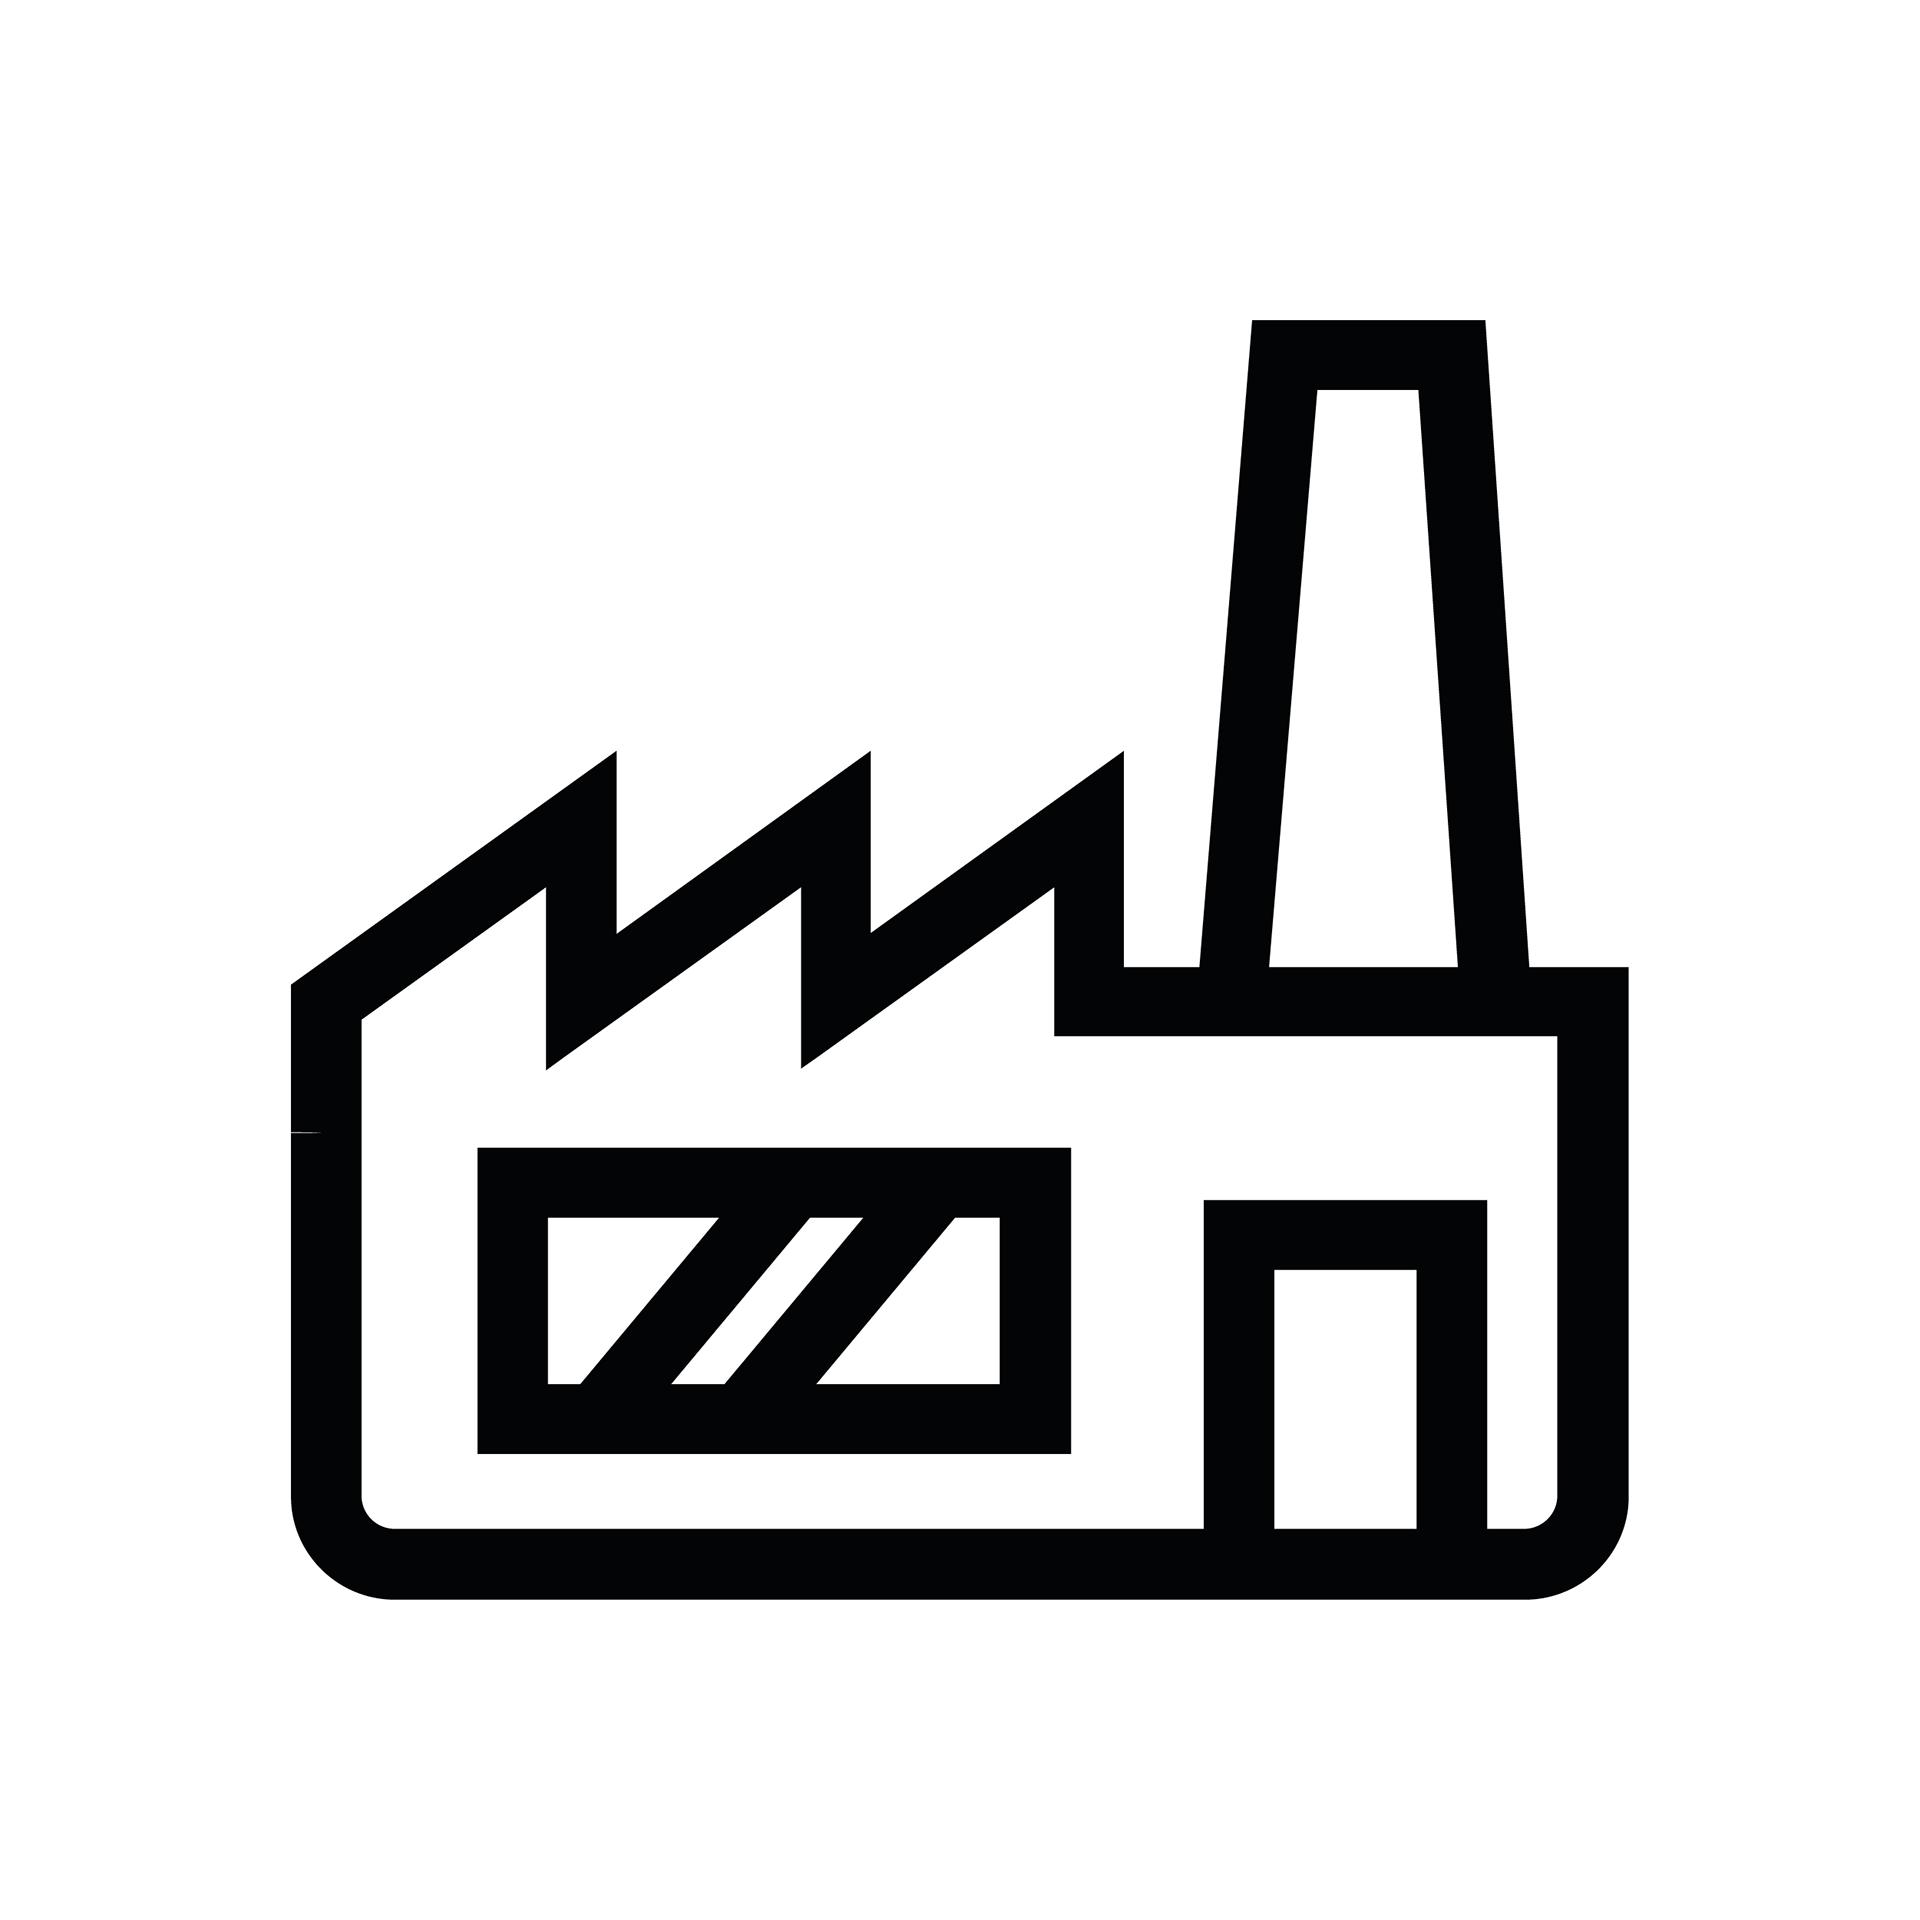 Bosch_Icon_Starter-Kit_Repro_Web_02